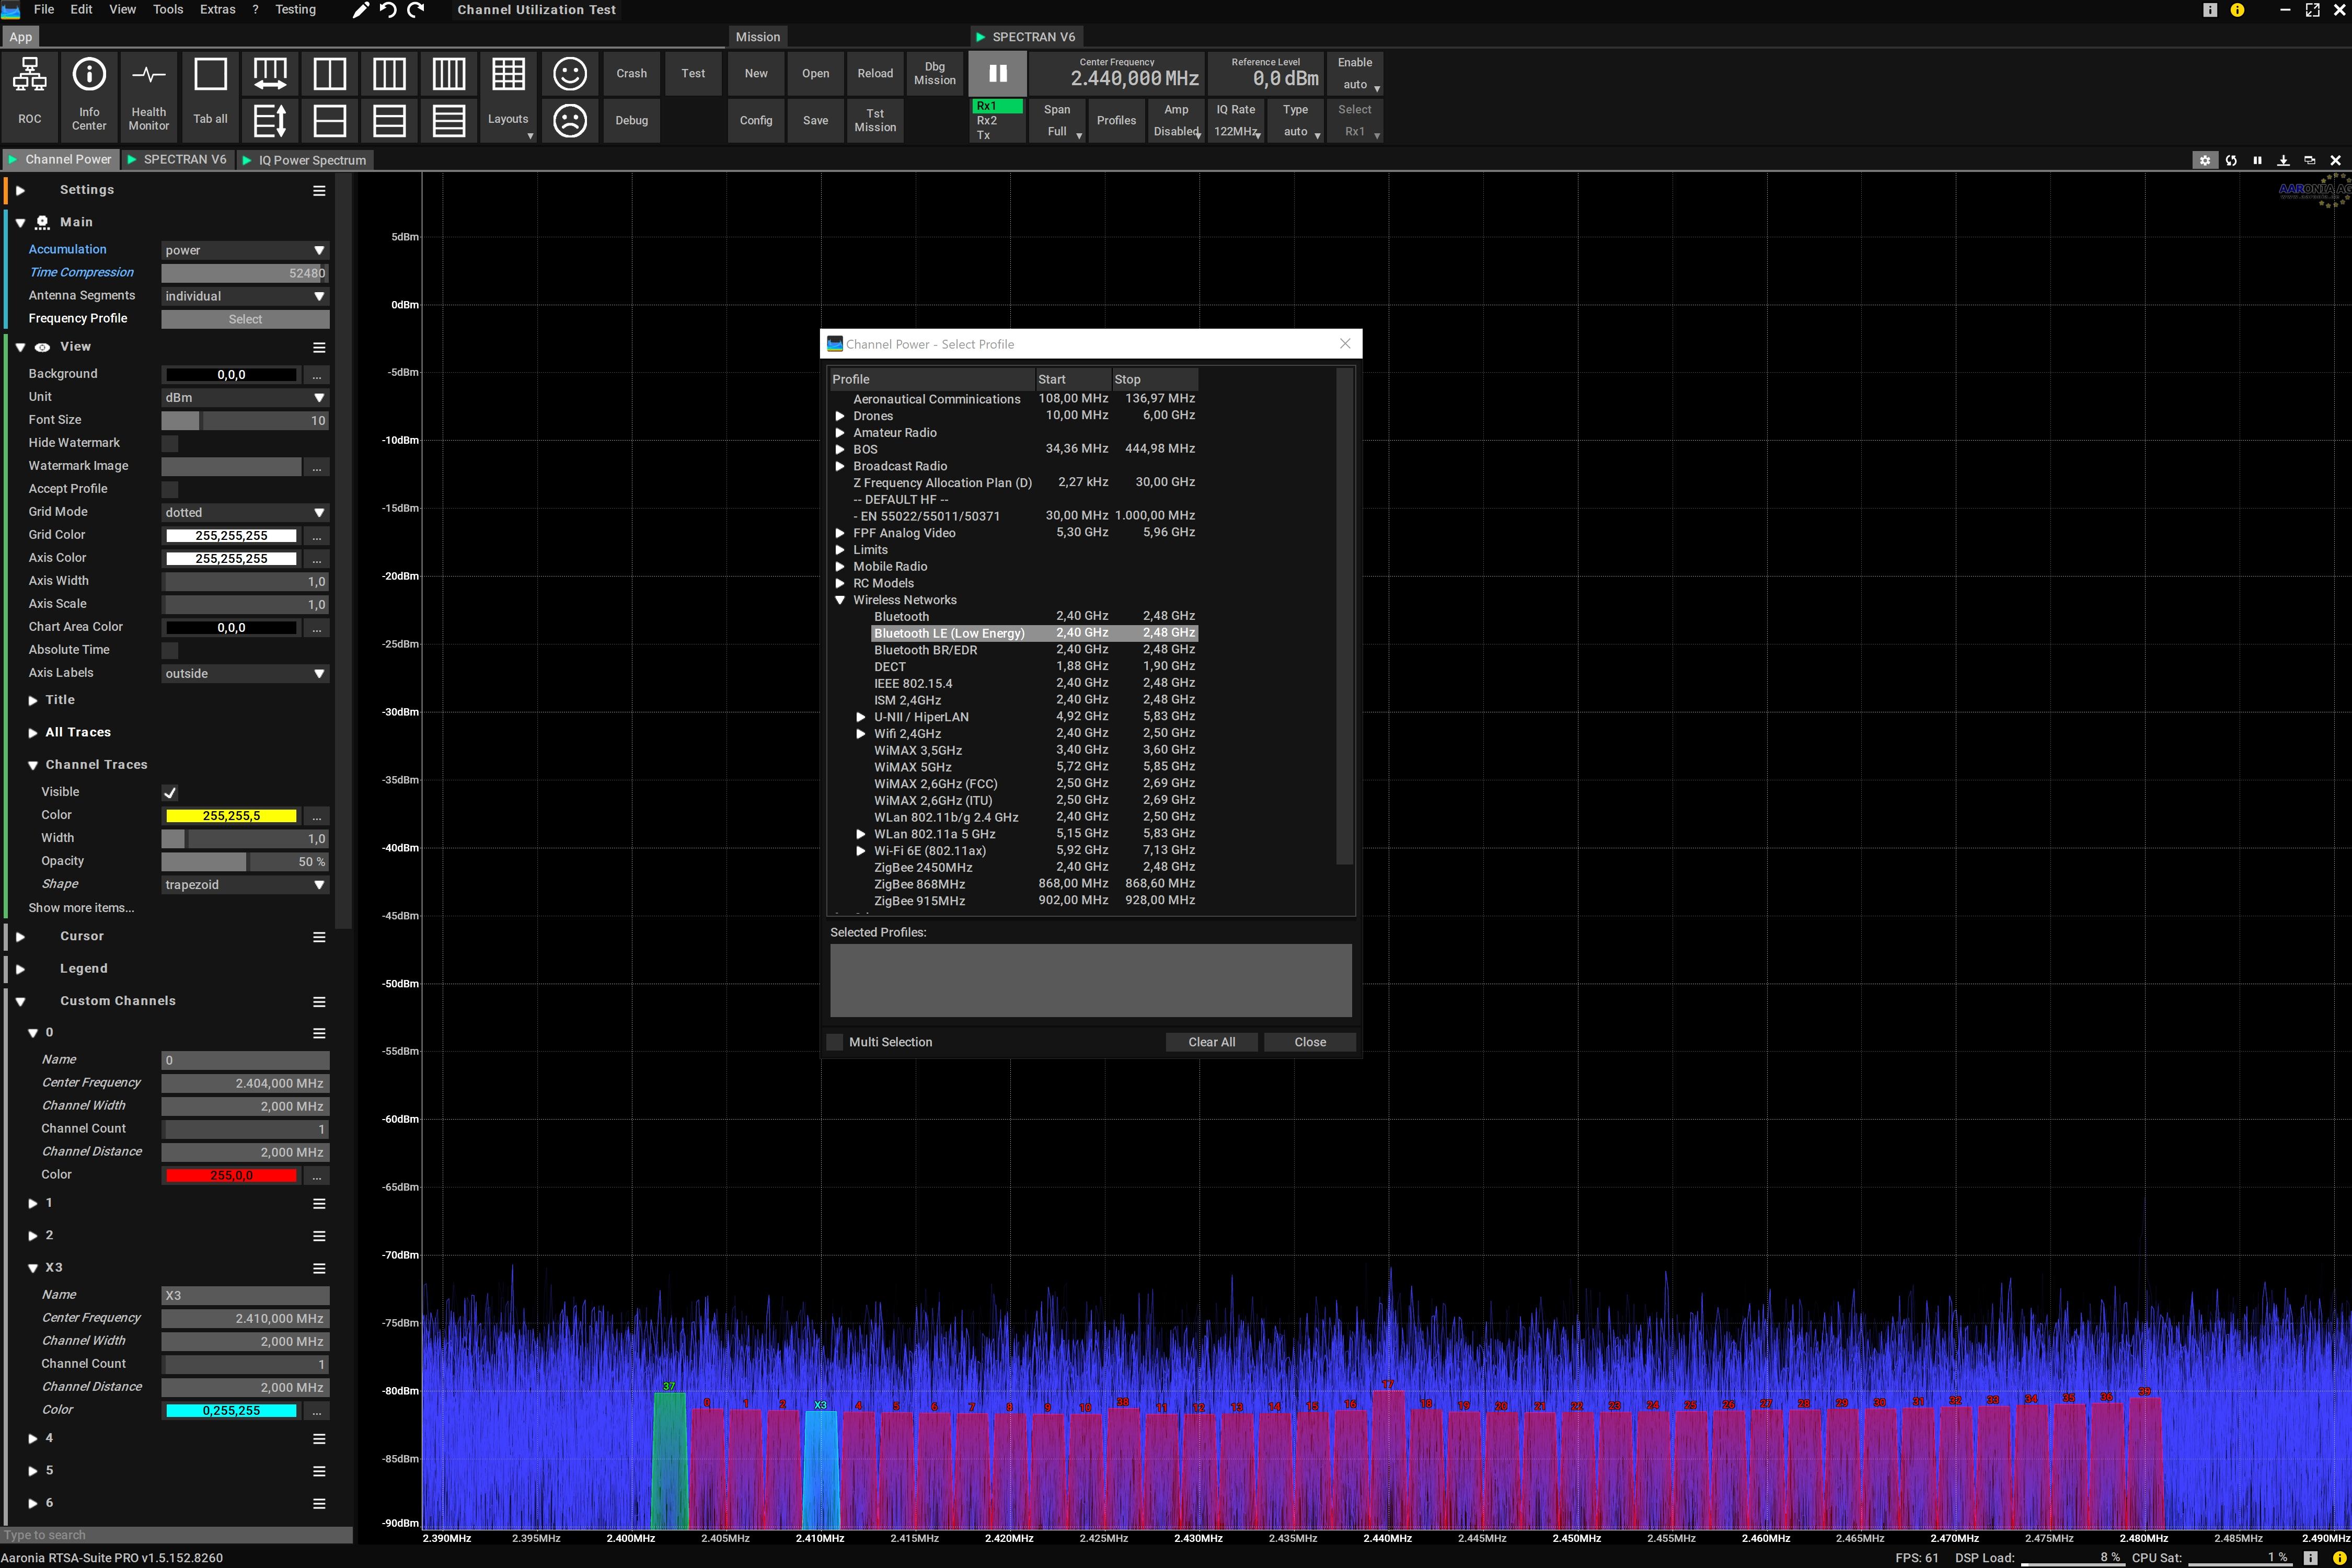 Channel Power Screenshot